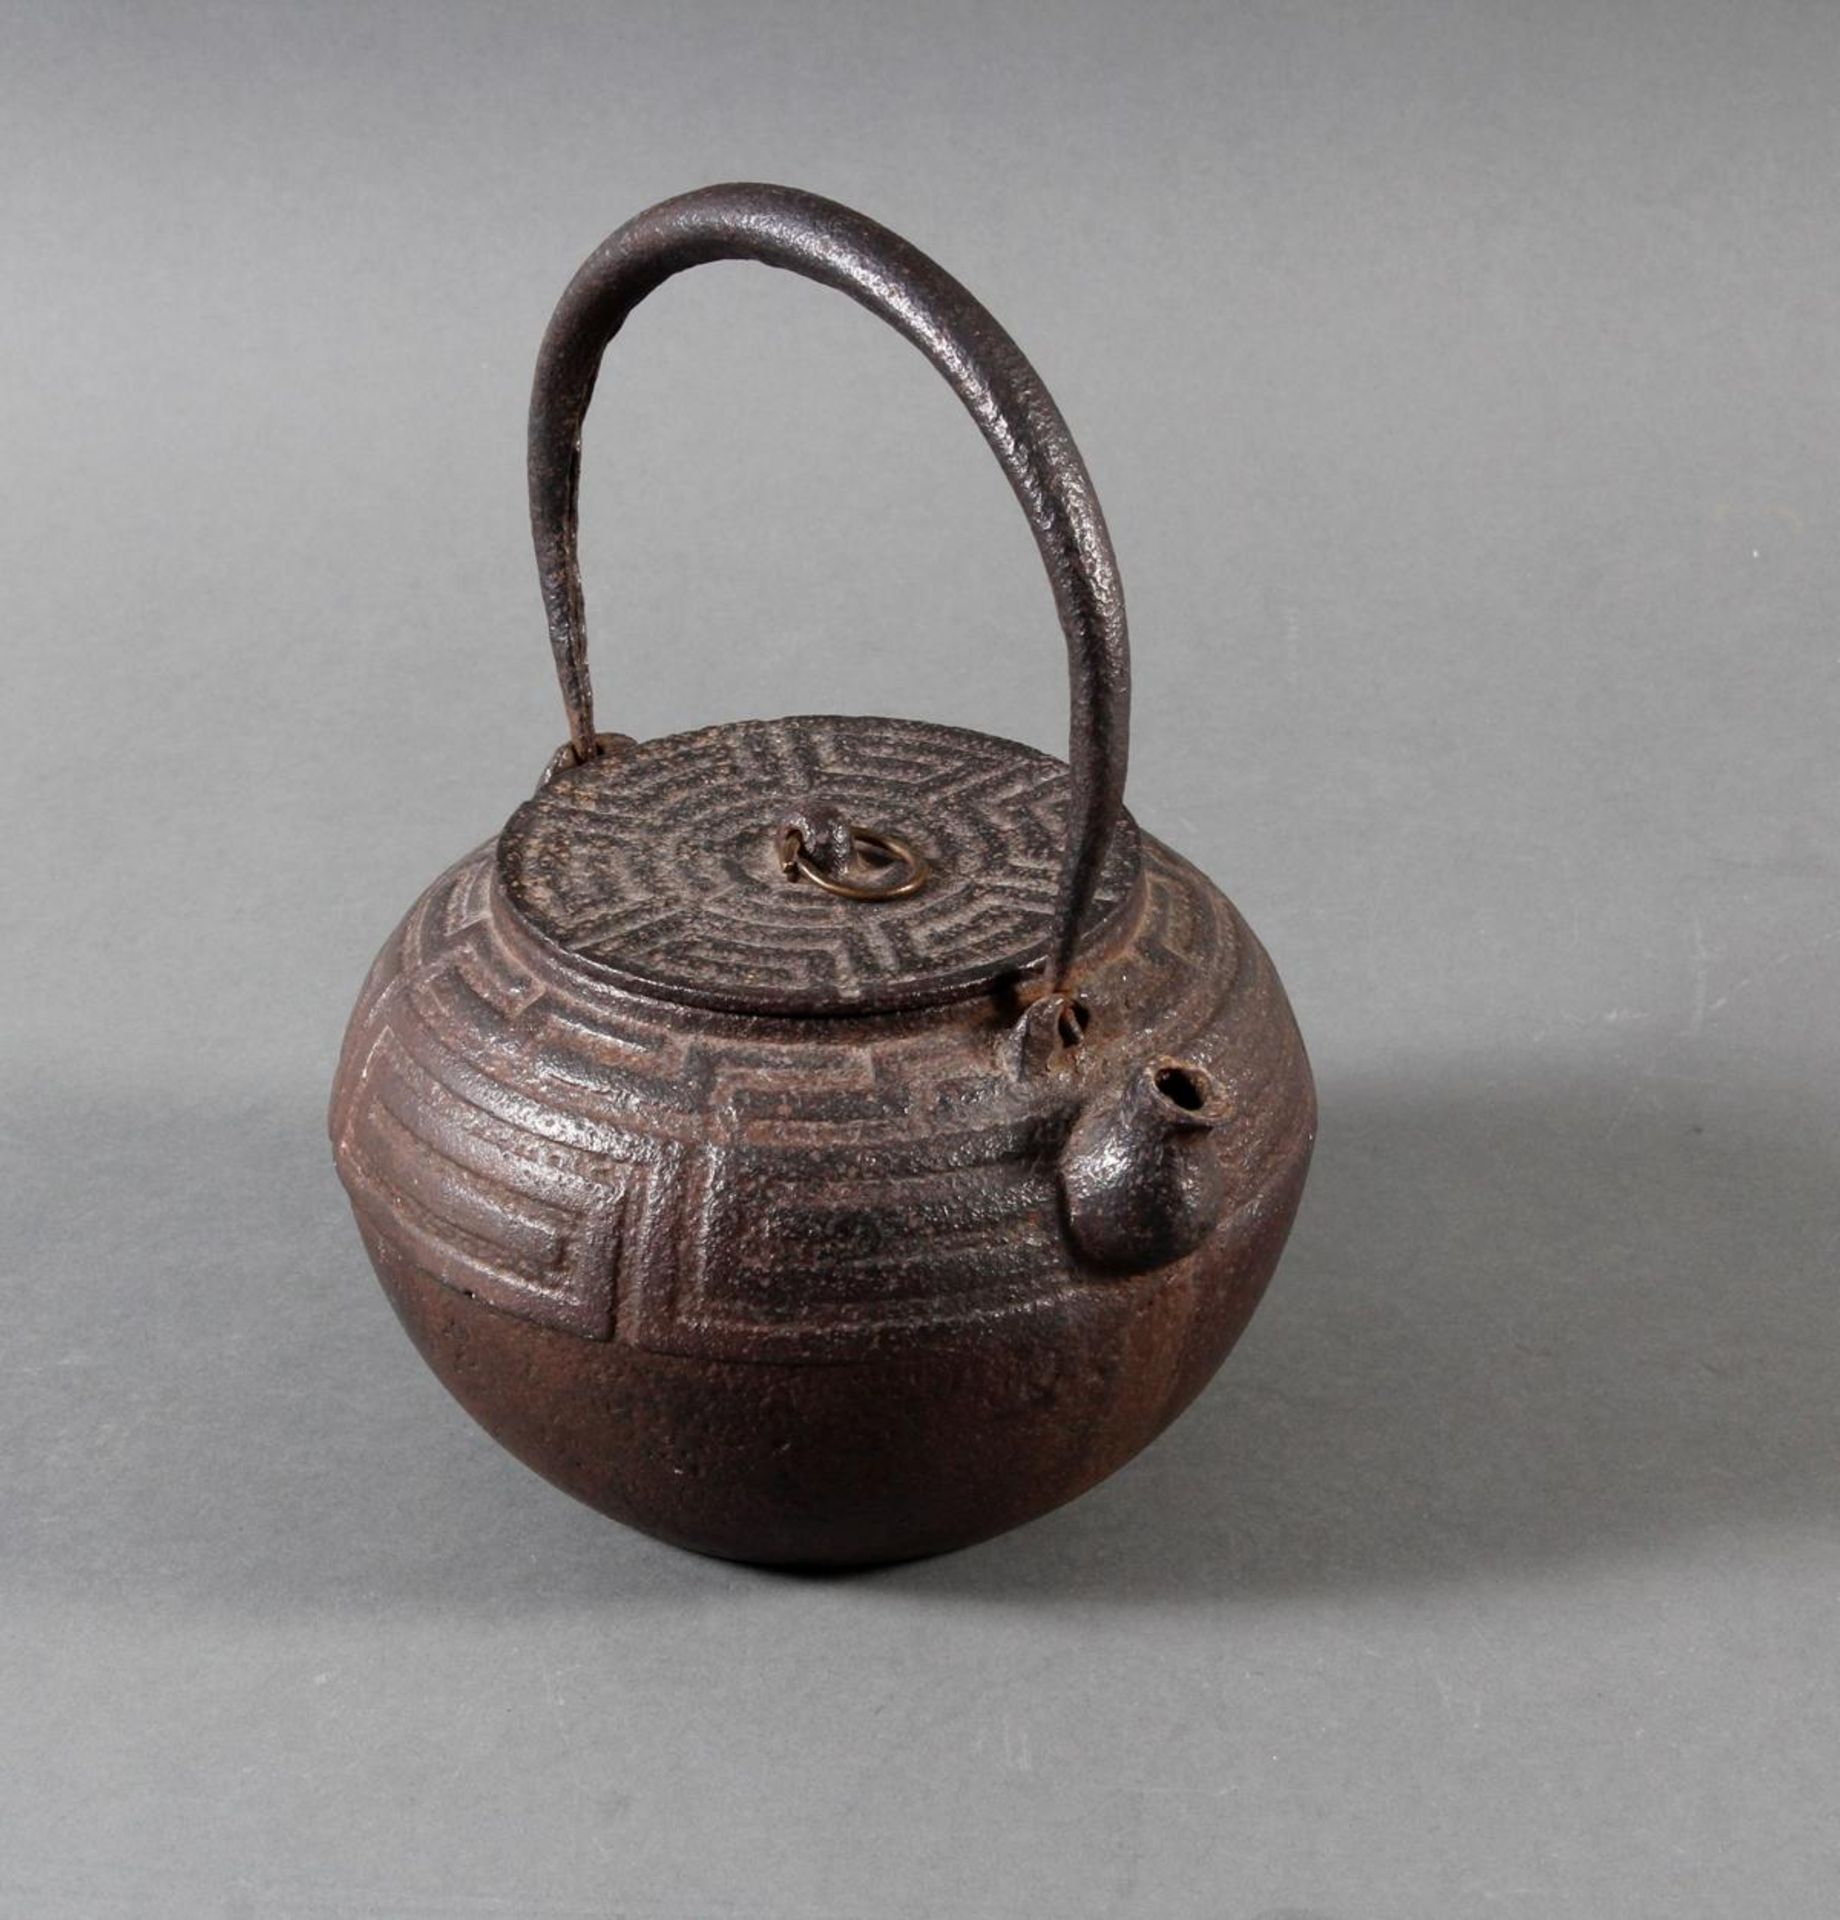 Gusseiserner Wasserkessel, China 18./19. Jahrhundert